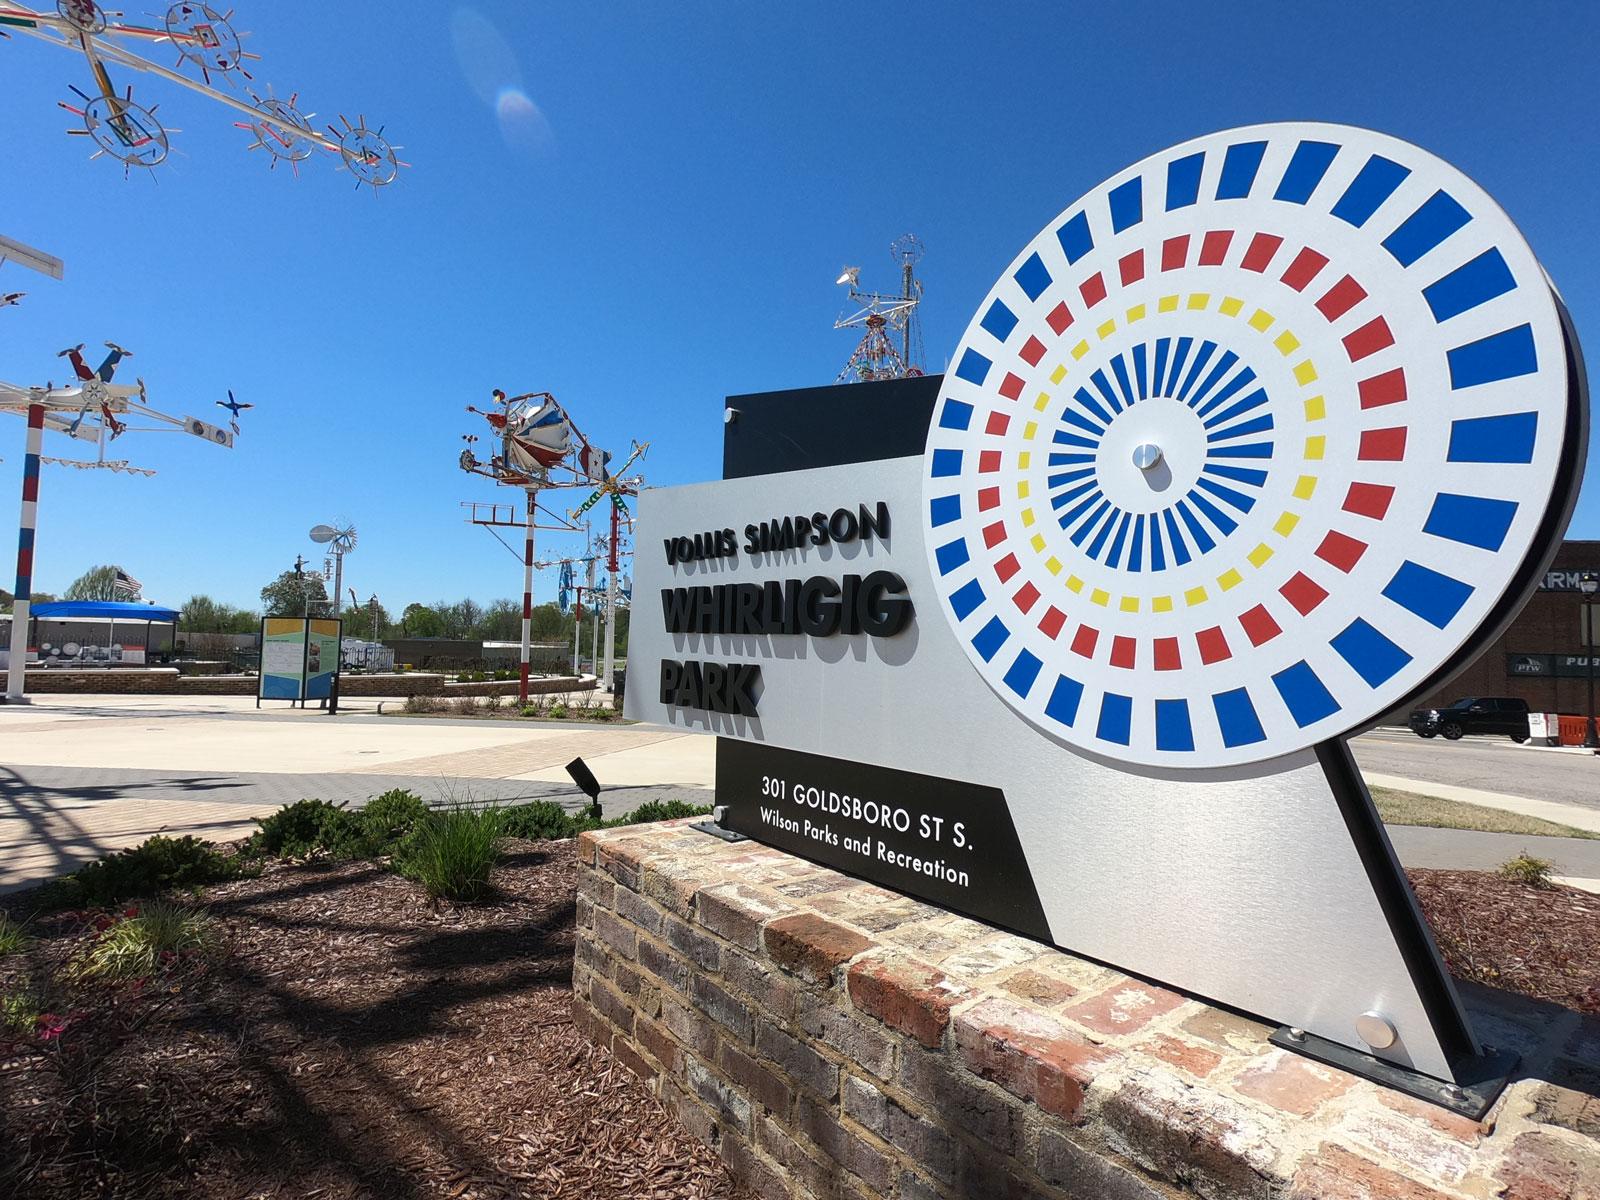 Vollis Simpson Whirligig Park multi-colored entrance sign, Wilson, North Carolina